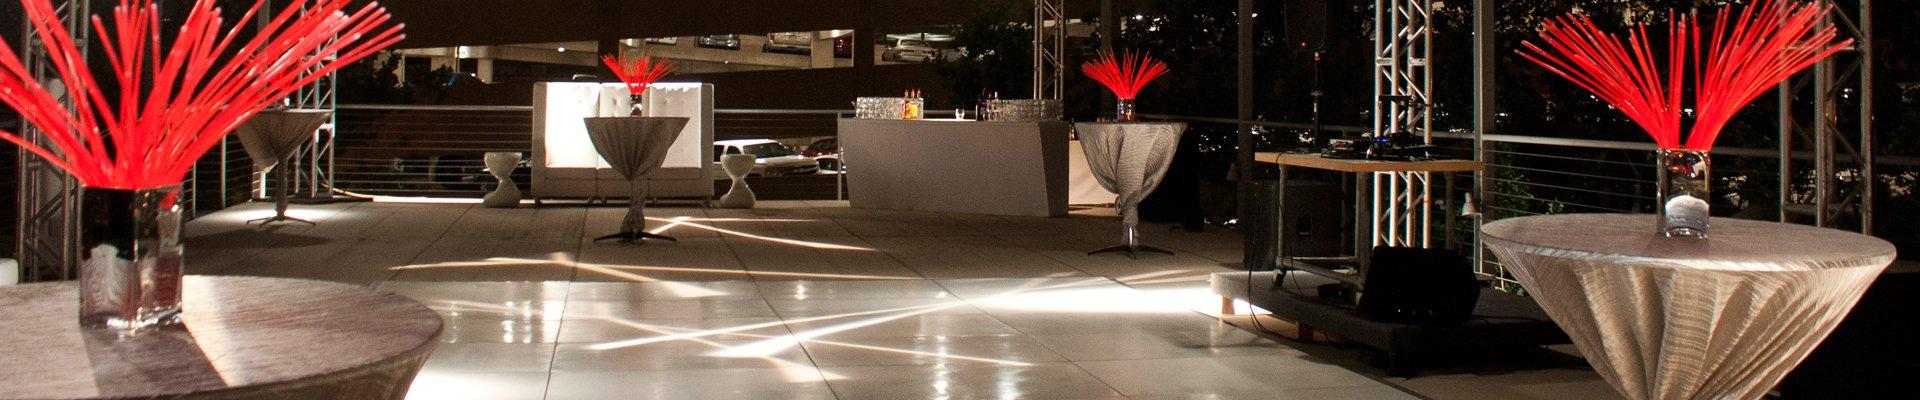 Event Rentals 187 Artpace